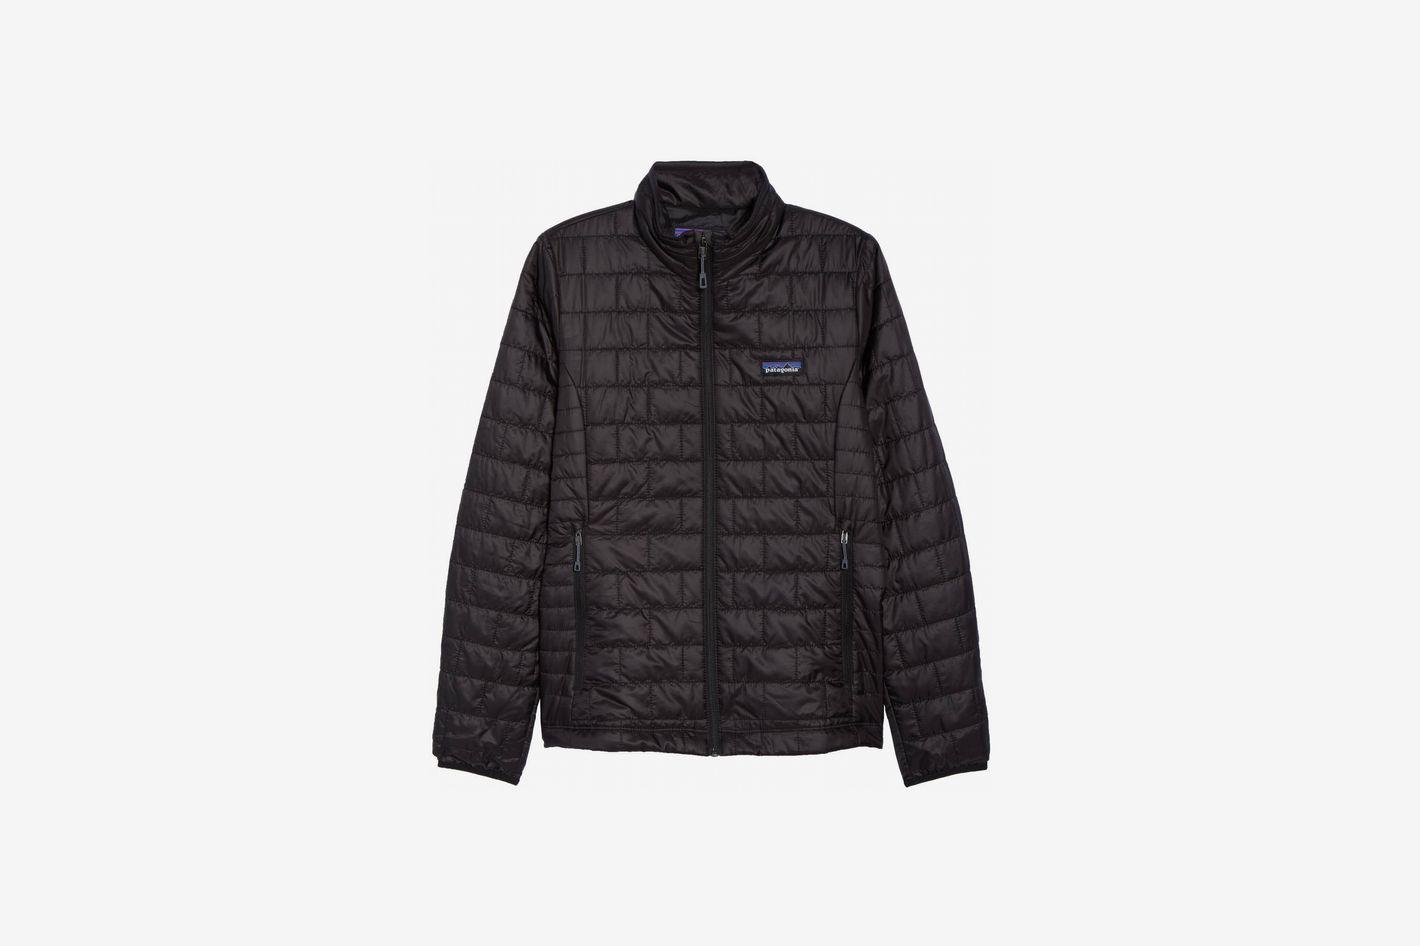 Patagonia Nano Puff®Water Resistant Jacket